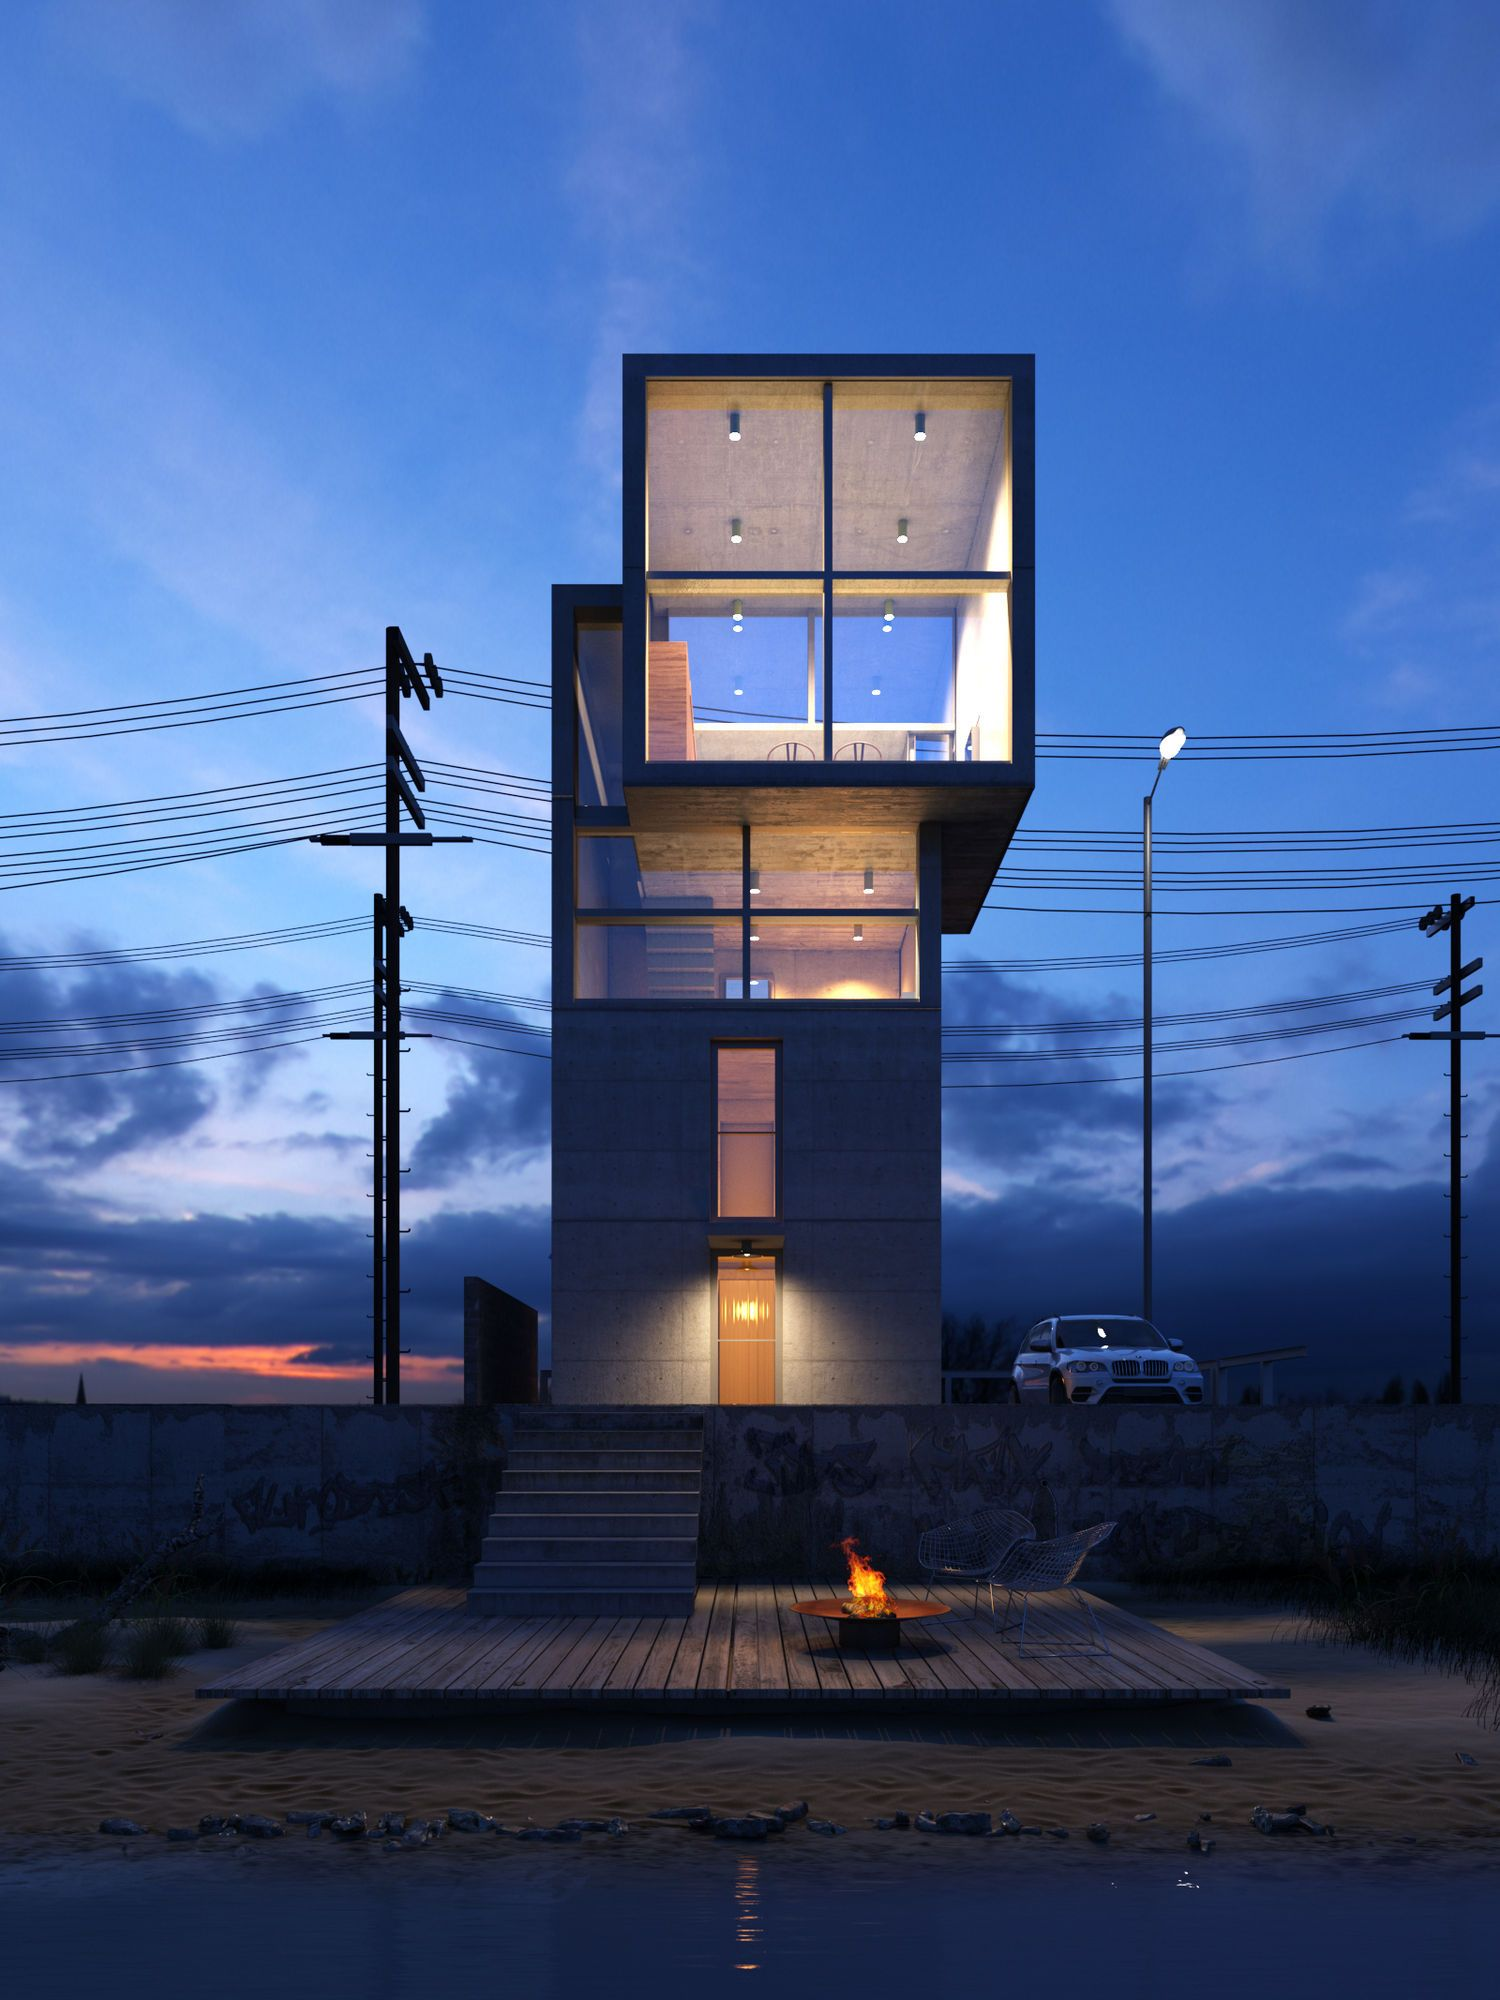 tadao ando 4x4 house a a n d o pinterest architektur